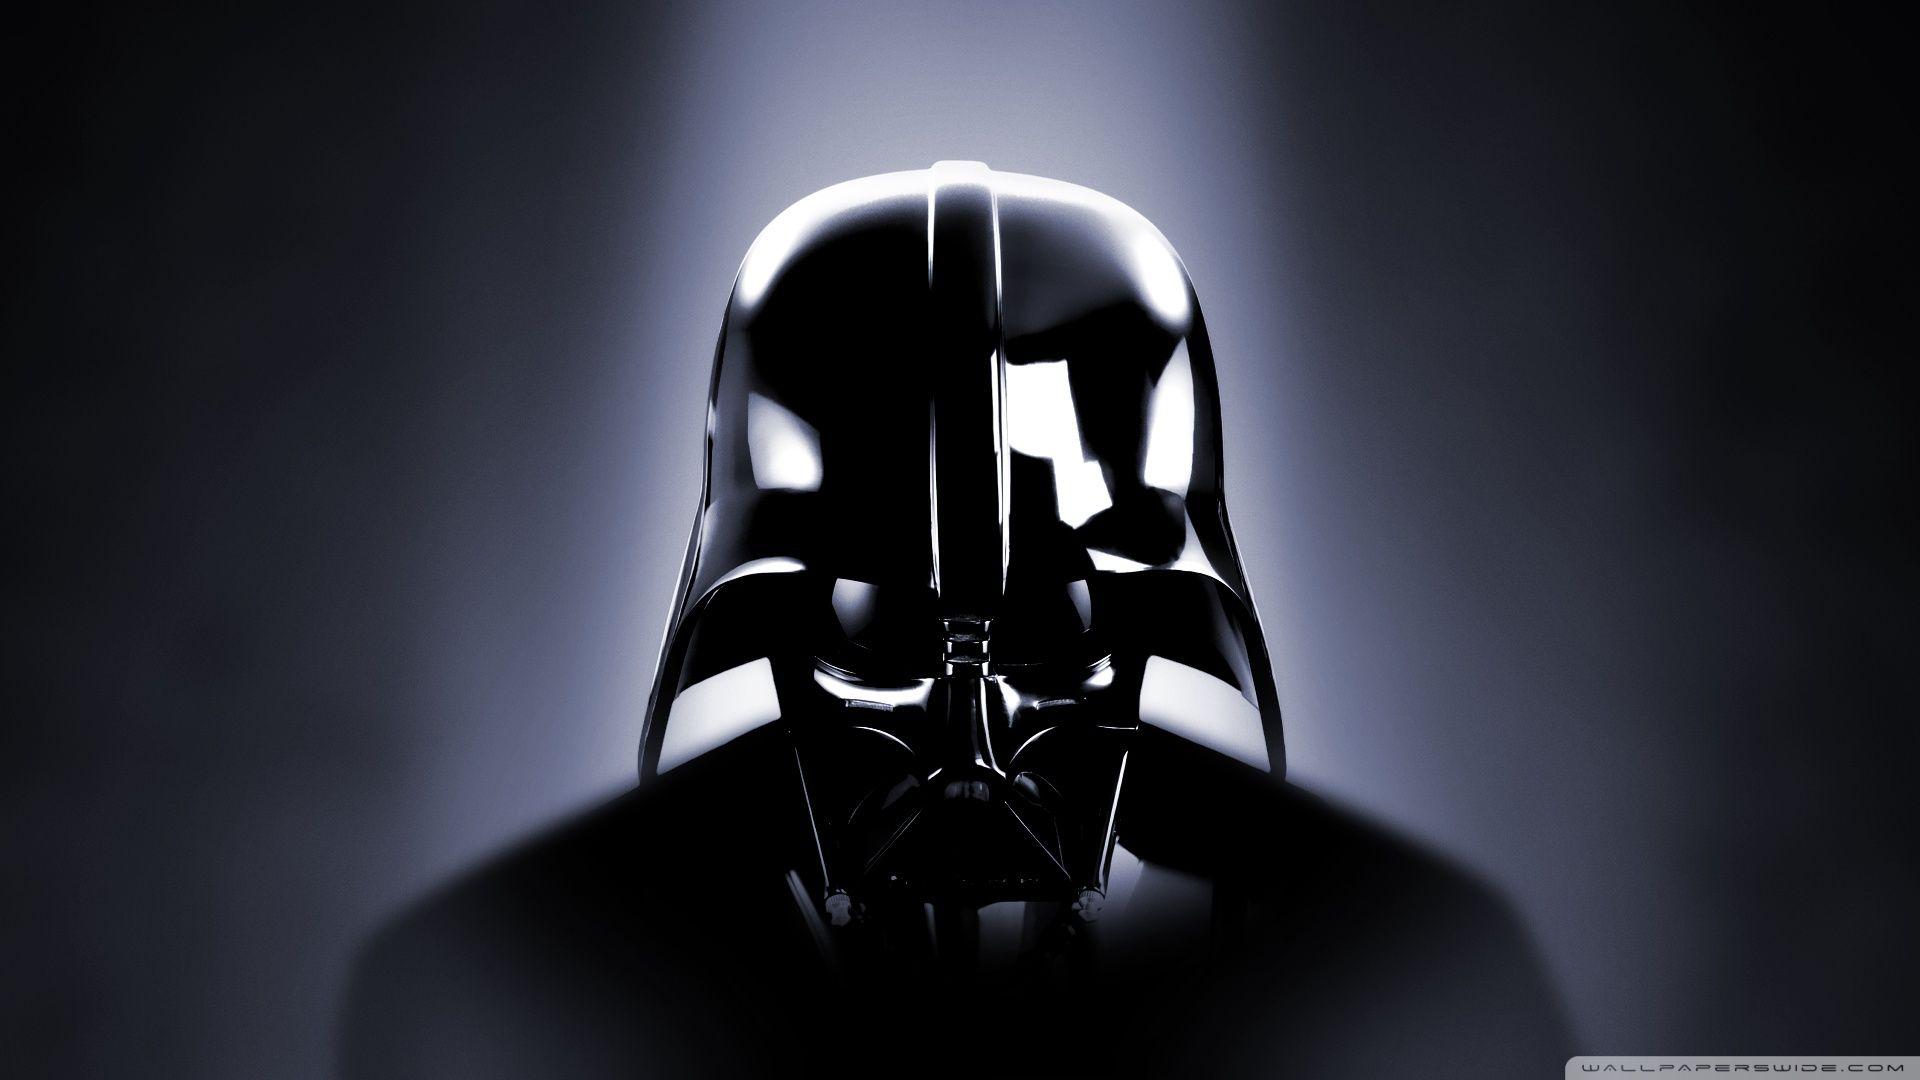 Darth Vader Wallpaper Iphone: Wallpapers Star Wars Hd Widescreen High Definition